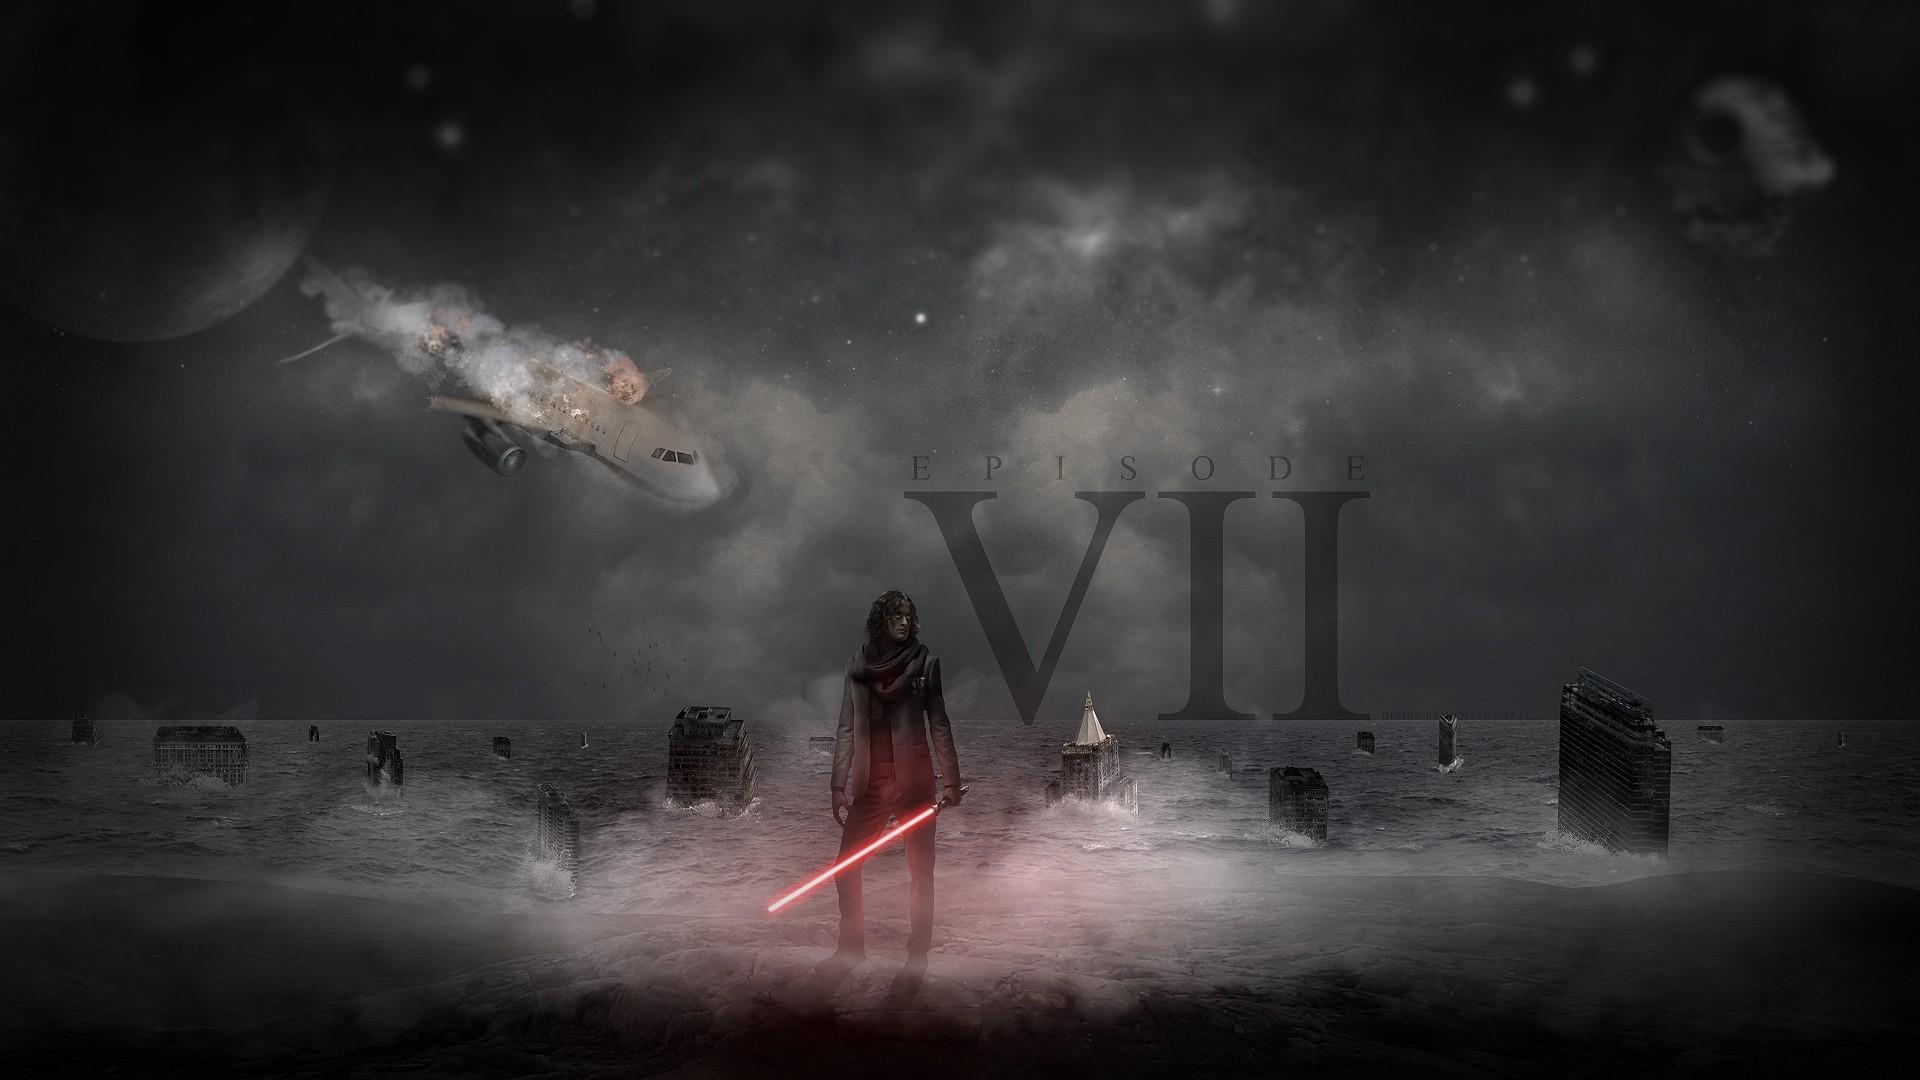 Star Wars The Force Awakens Wallpaper 1920x1080 ·①